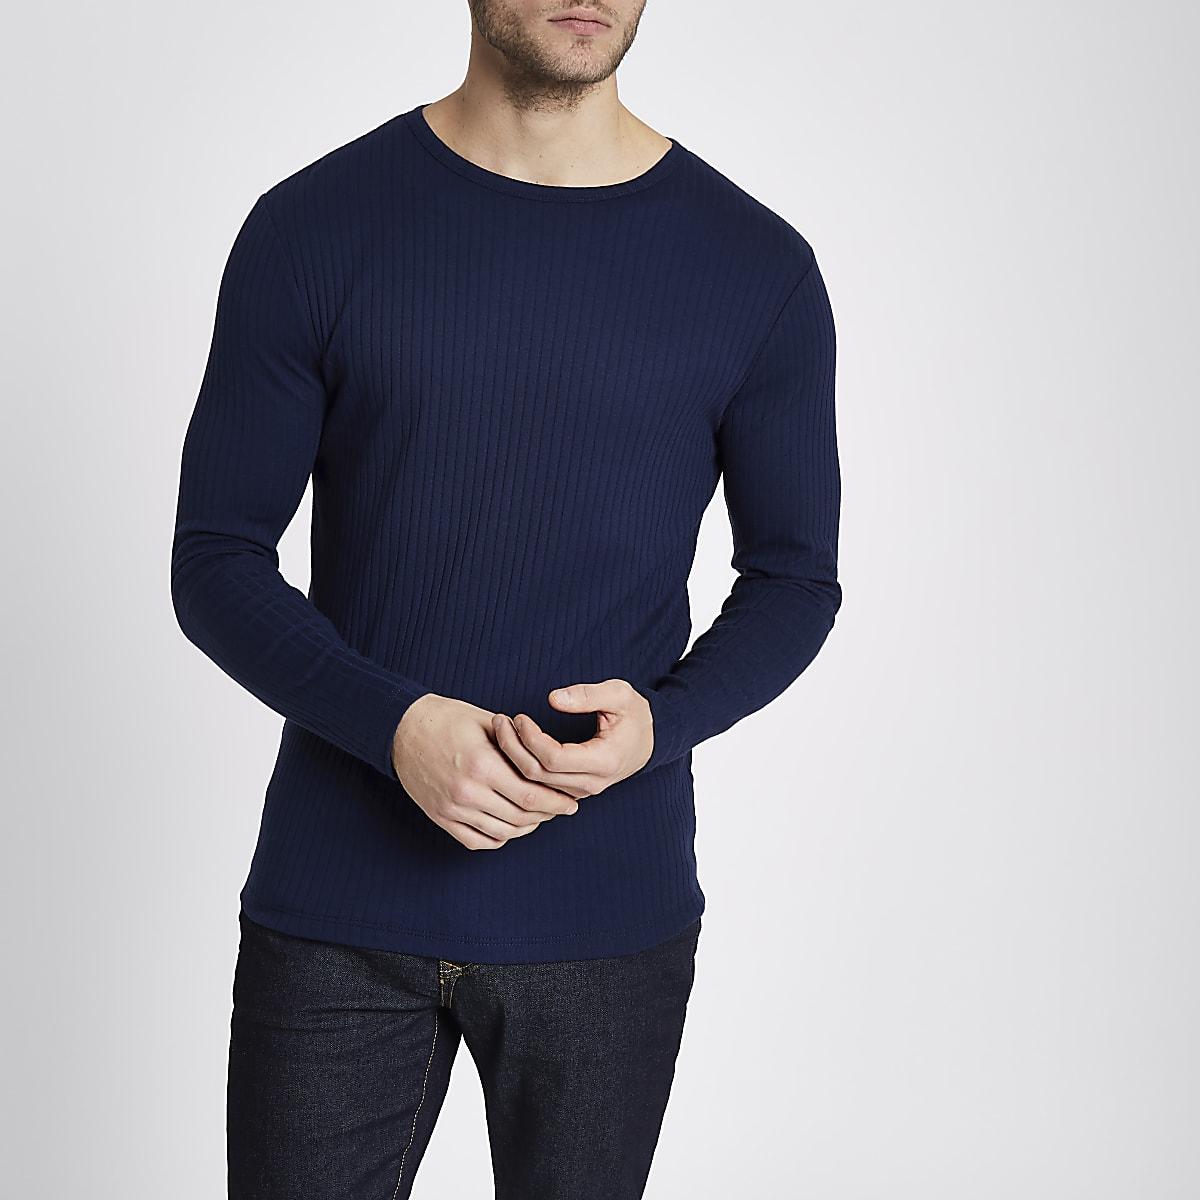 dc82392f07469c Dark blue ribbed slim fit T-shirt - Long Sleeve T-Shirts - T-Shirts & Vests  - men